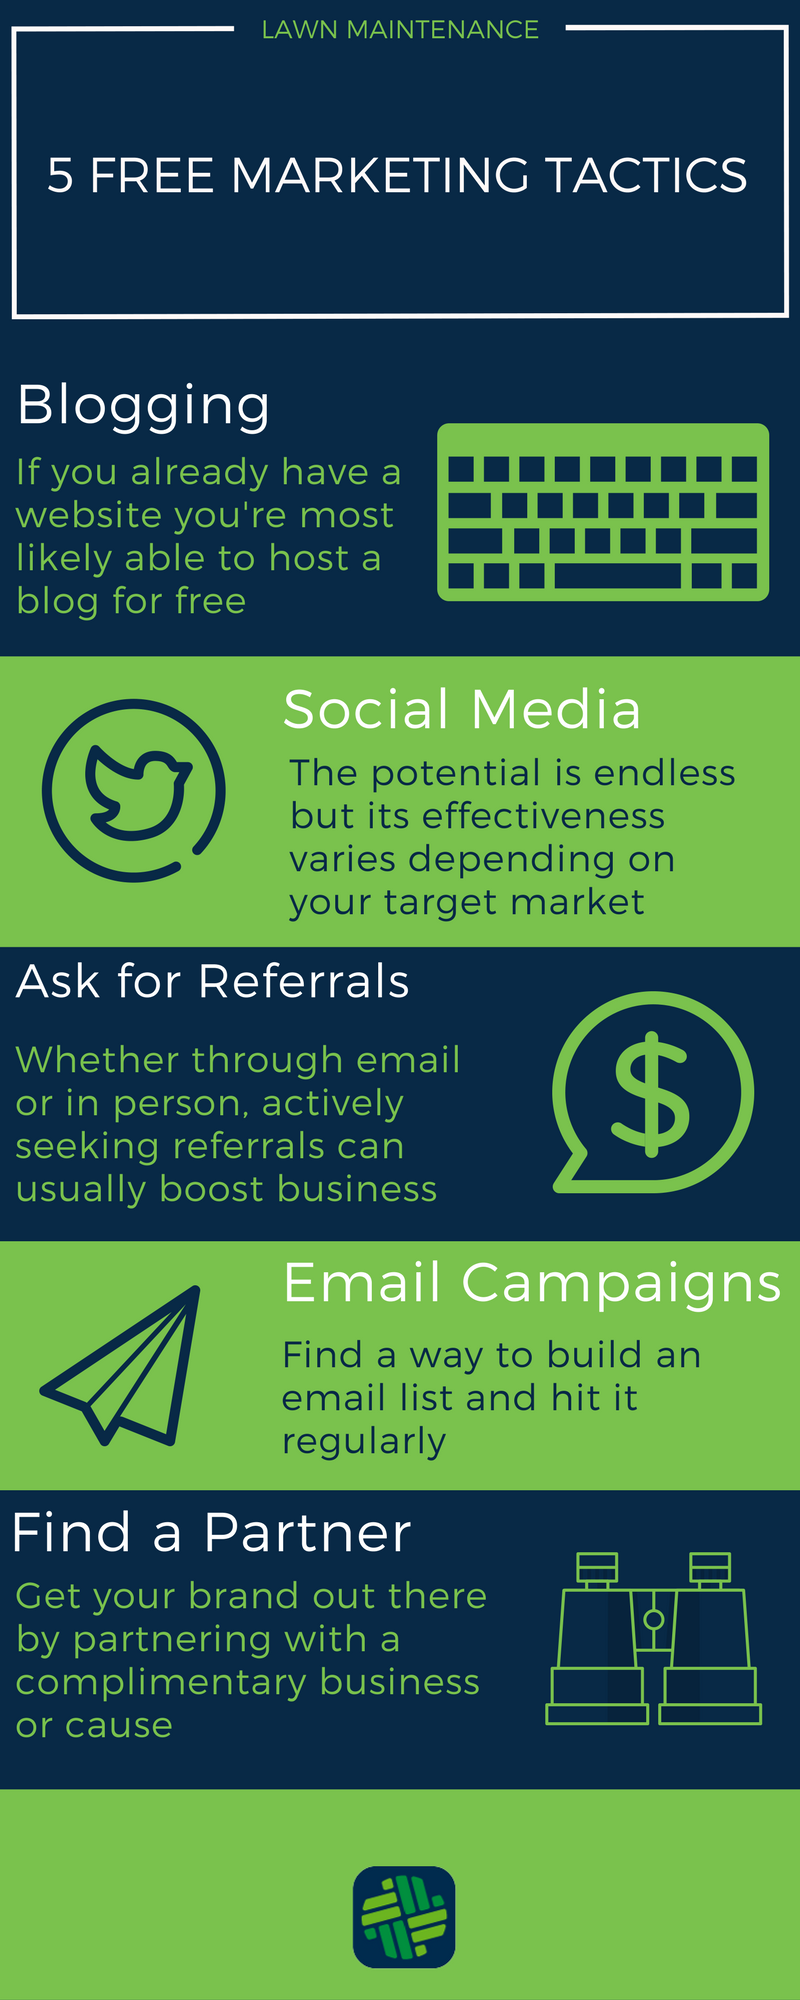 Lawn Maintenance- 5 Free Marketing Tactics.png